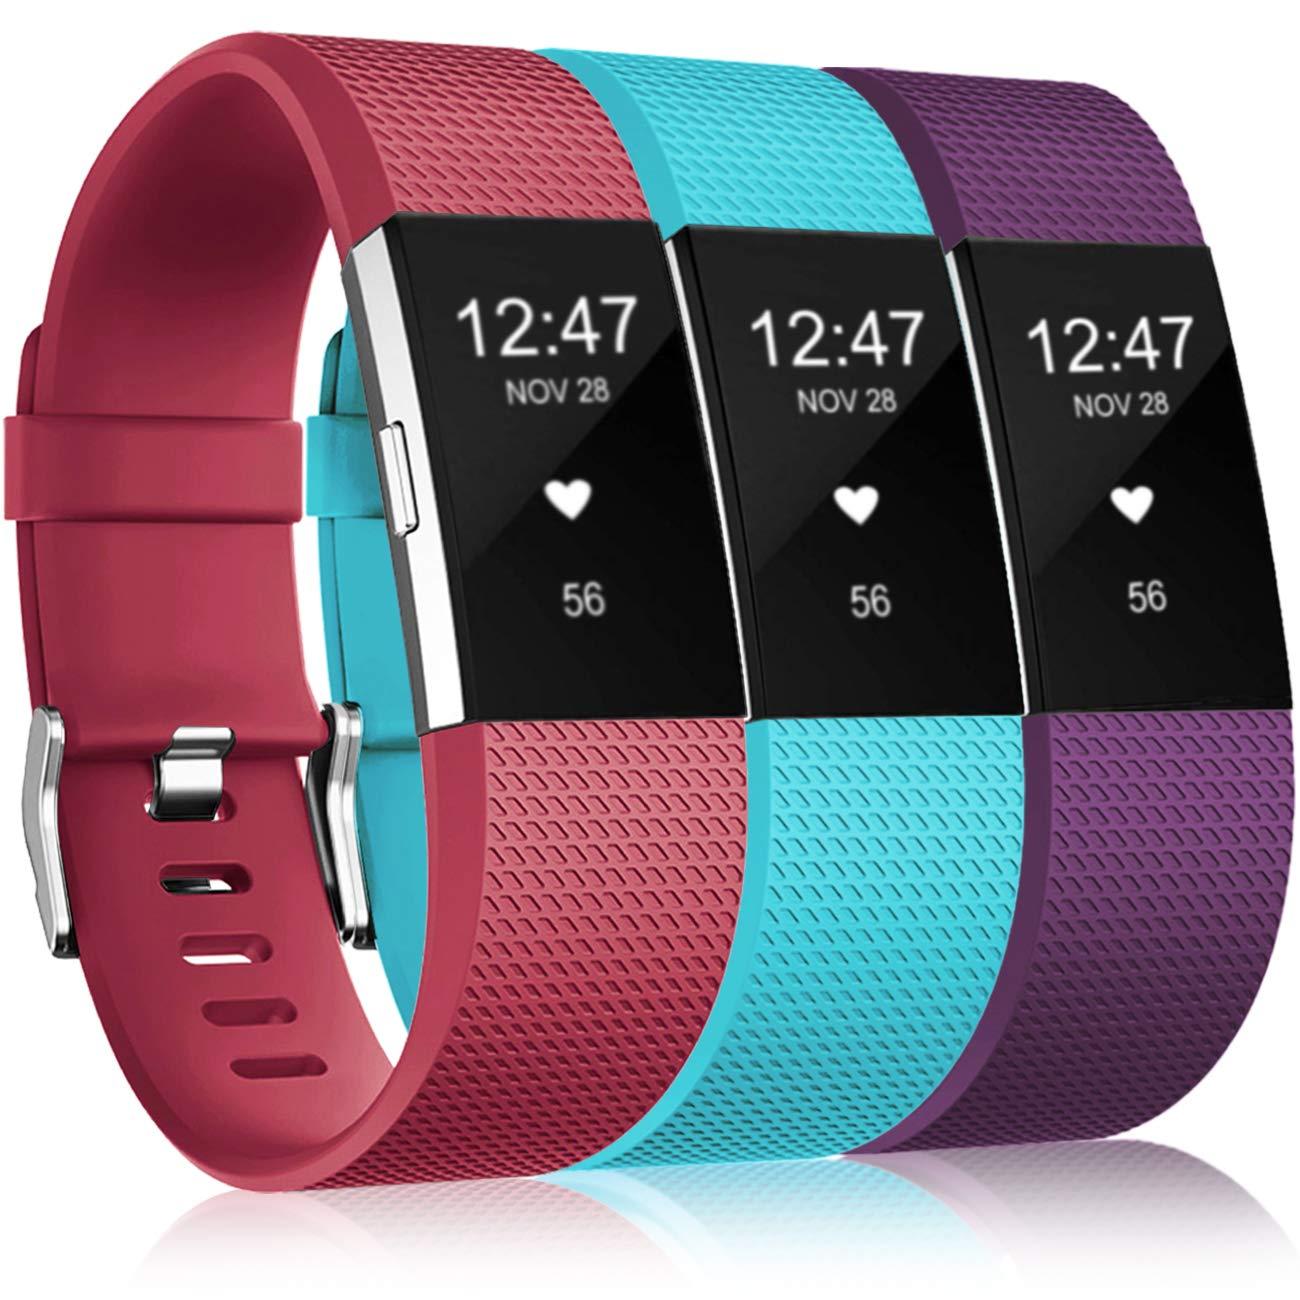 Mallas De Reloj Fitbit Charge 2 (3 Unidades) (lbxs)